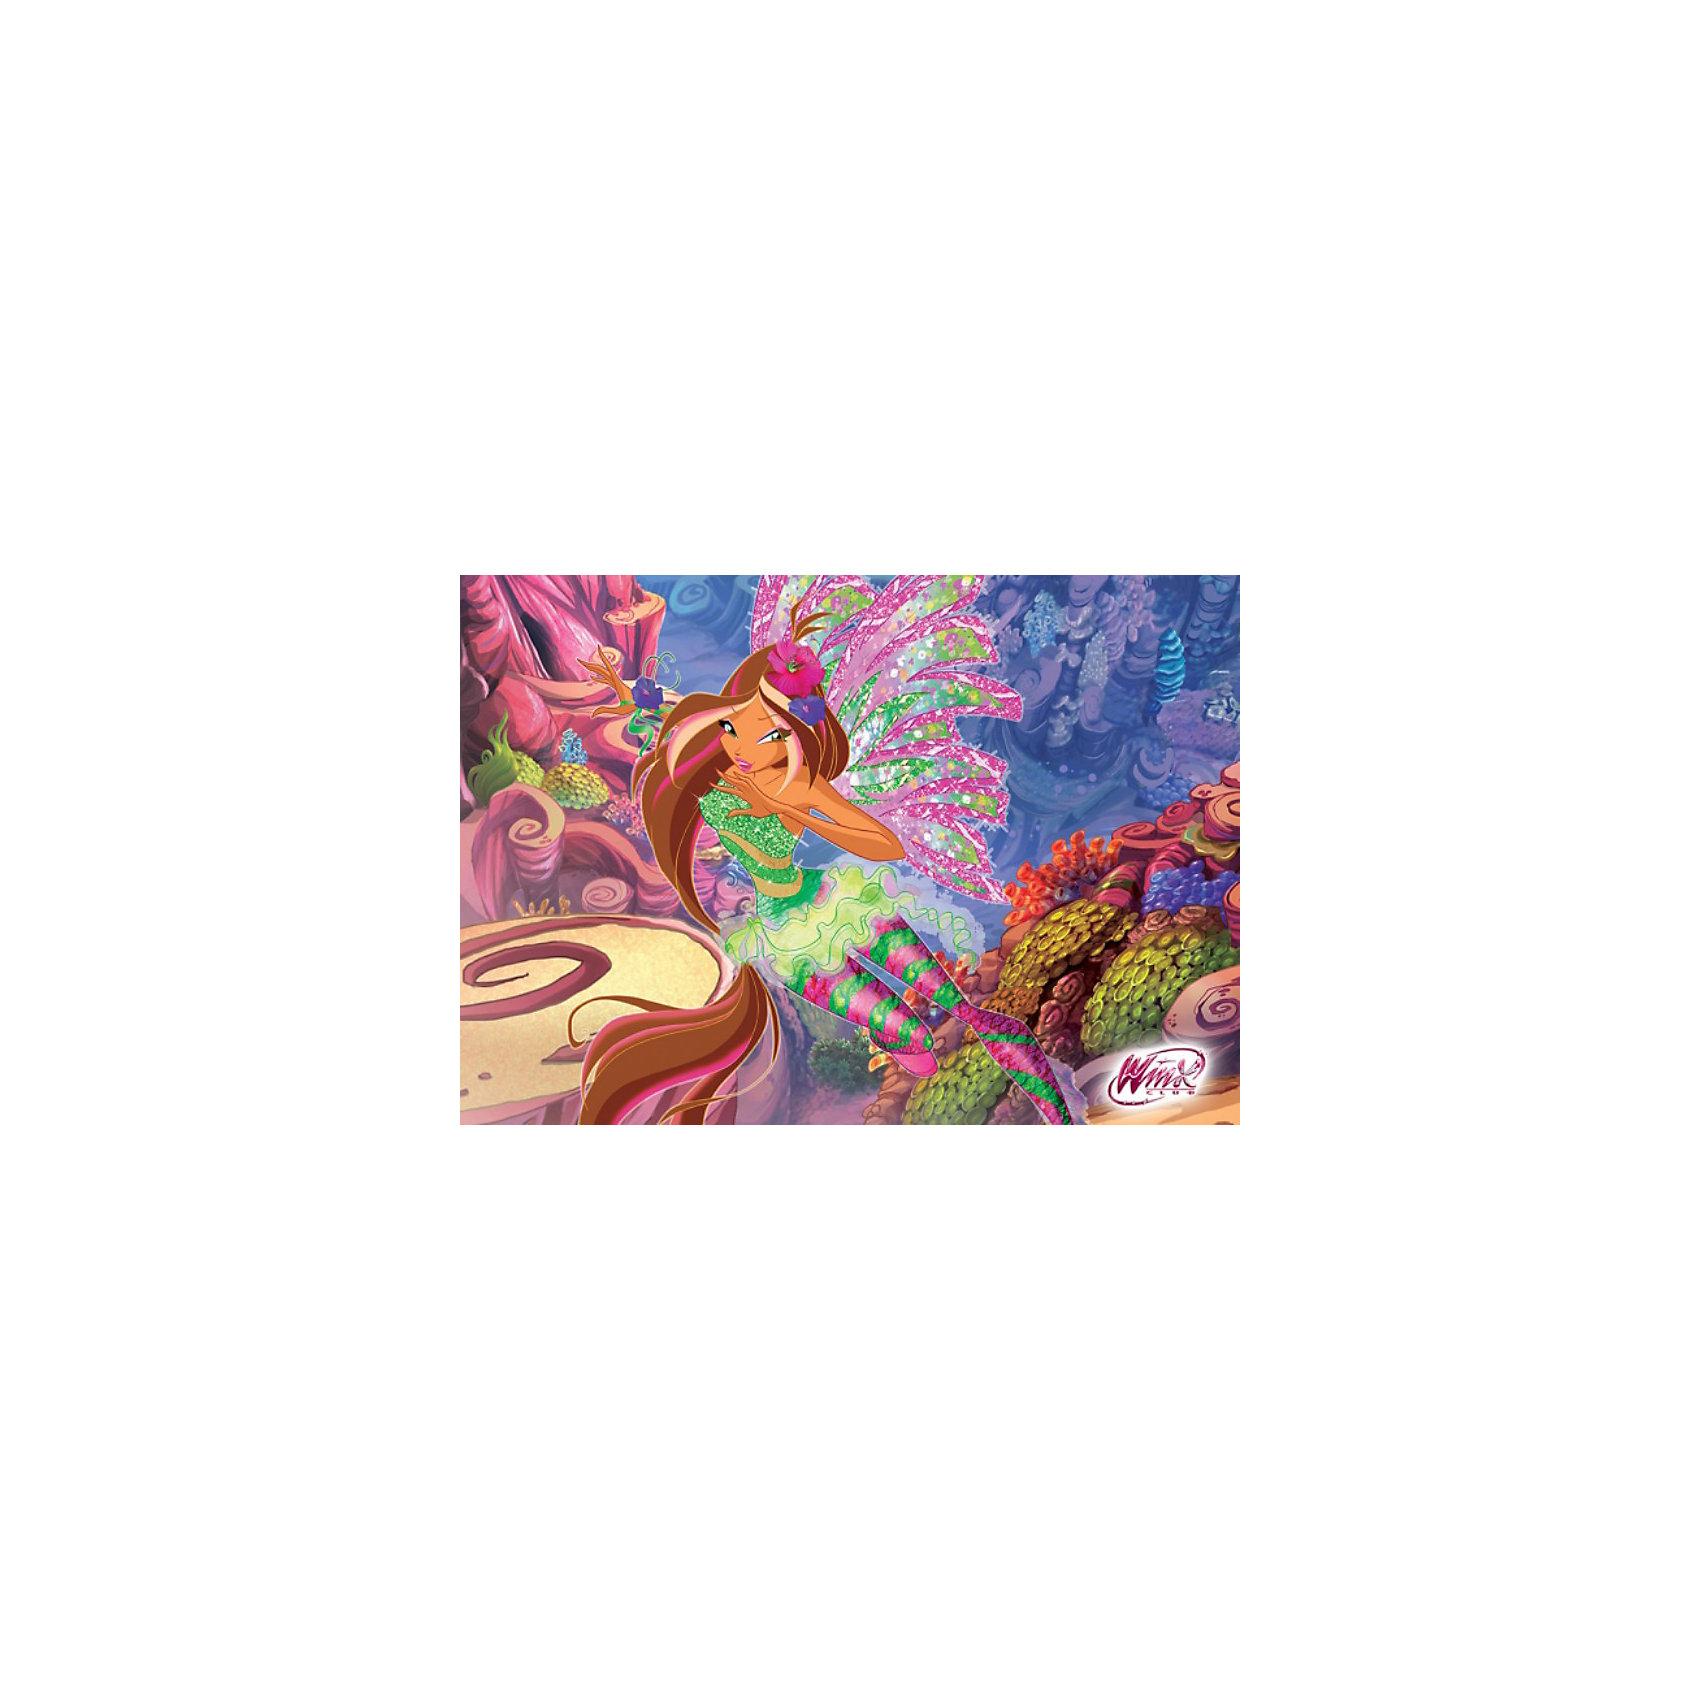 Castorland Пазл Флора, Winx Club, 30 деталей, Castorland украшение для стен и предметов интерьера winx флора